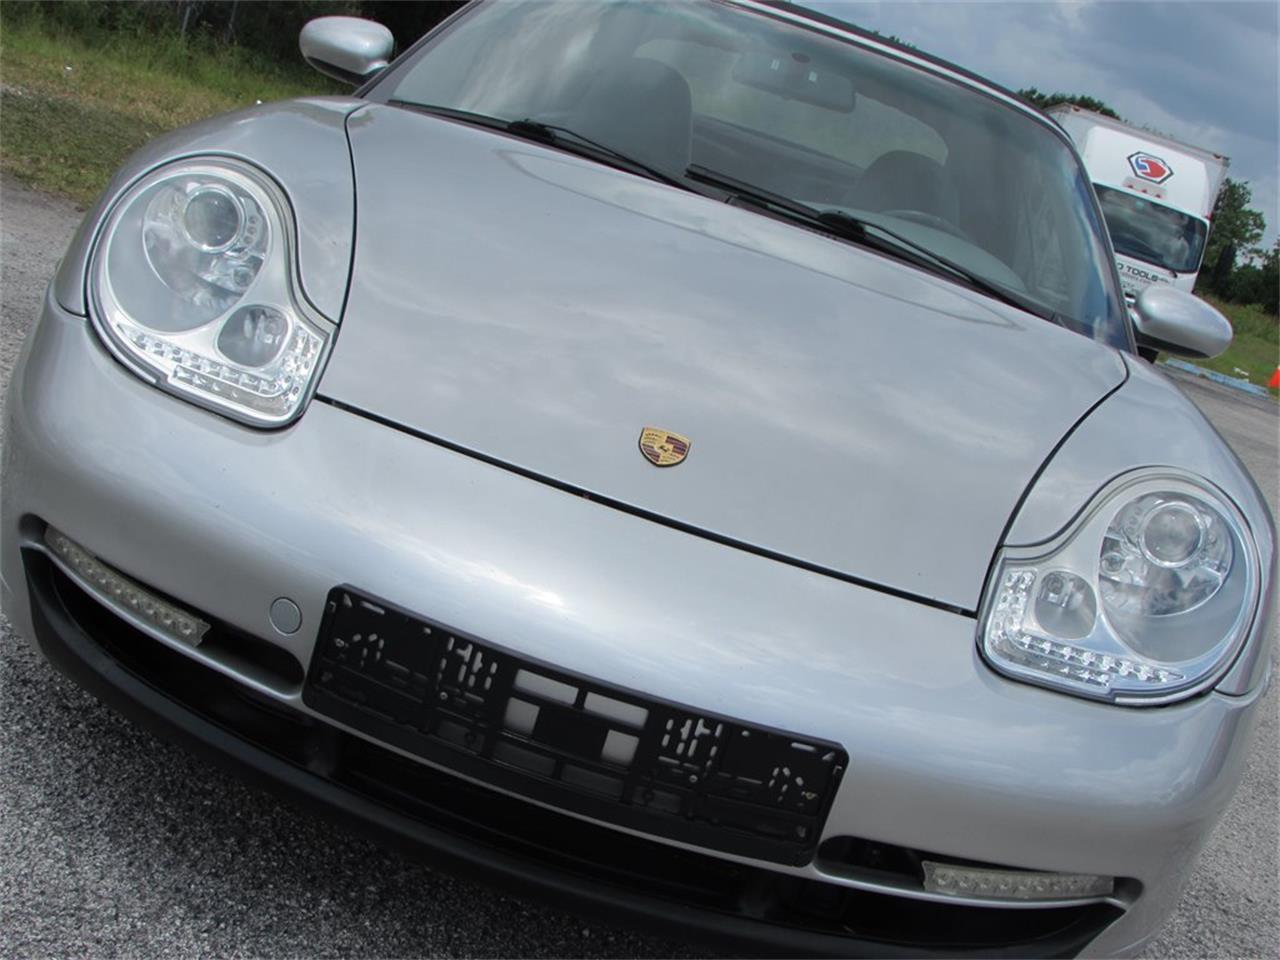 2000 Porsche 911 Carrera (CC-1237744) for sale in Orlando, Florida